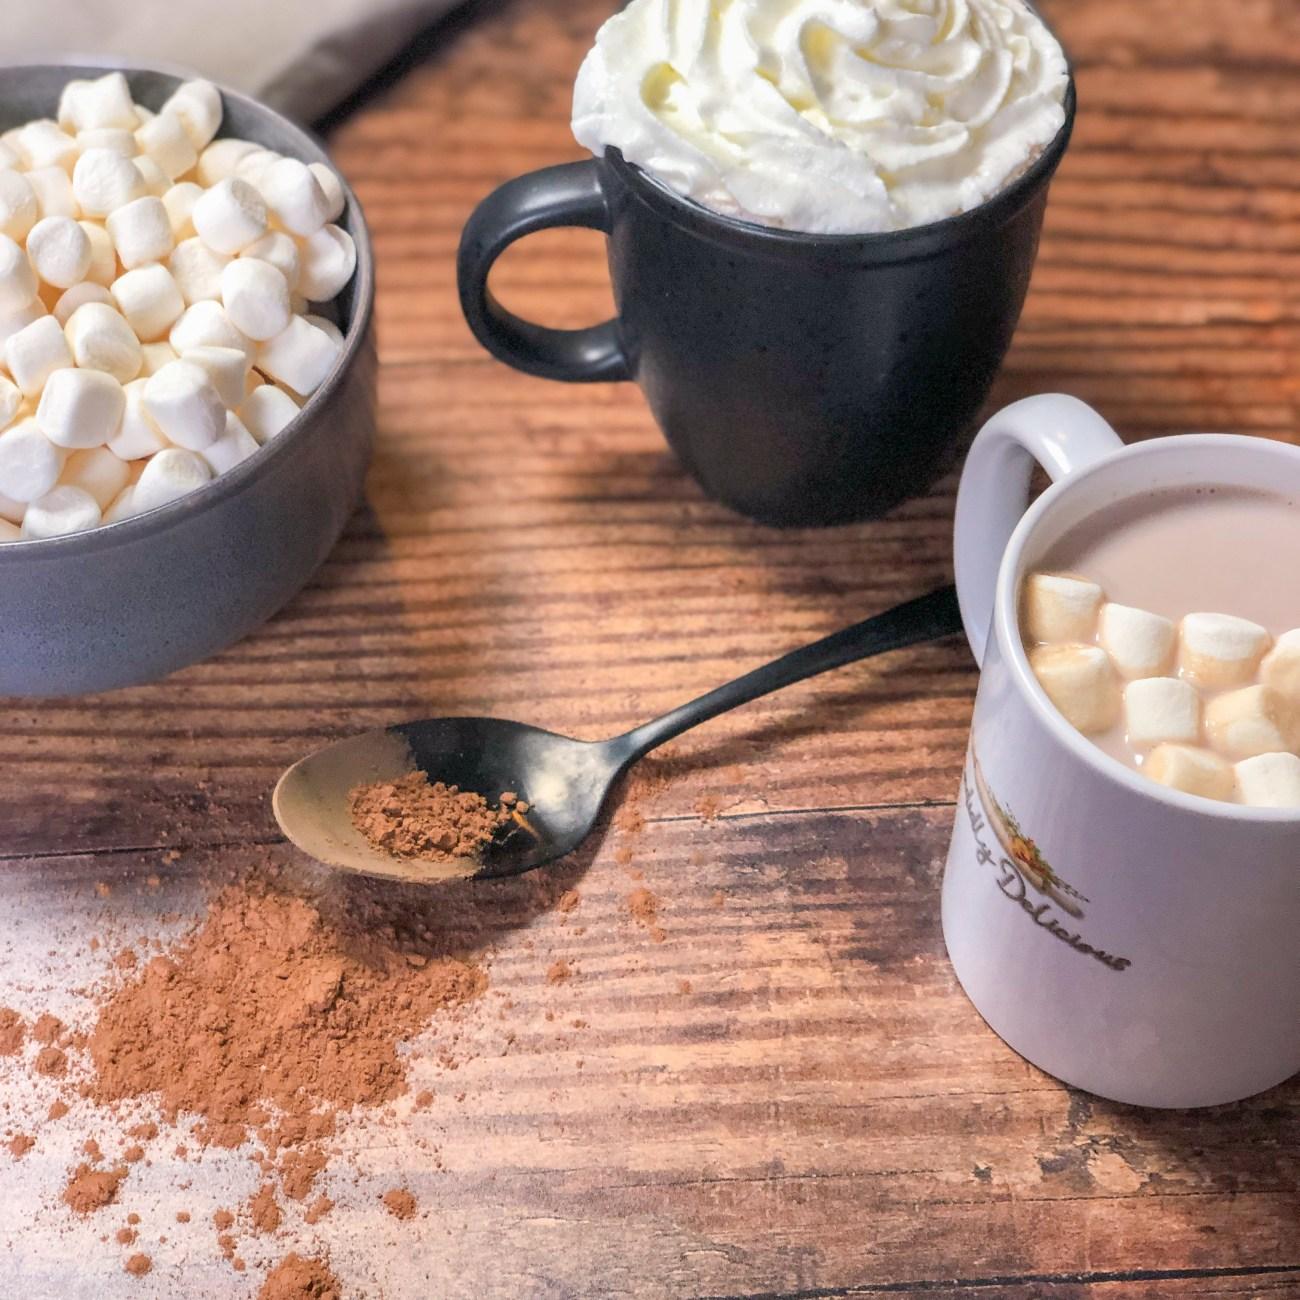 Creamy Decadent Homemade Hot Cocoa